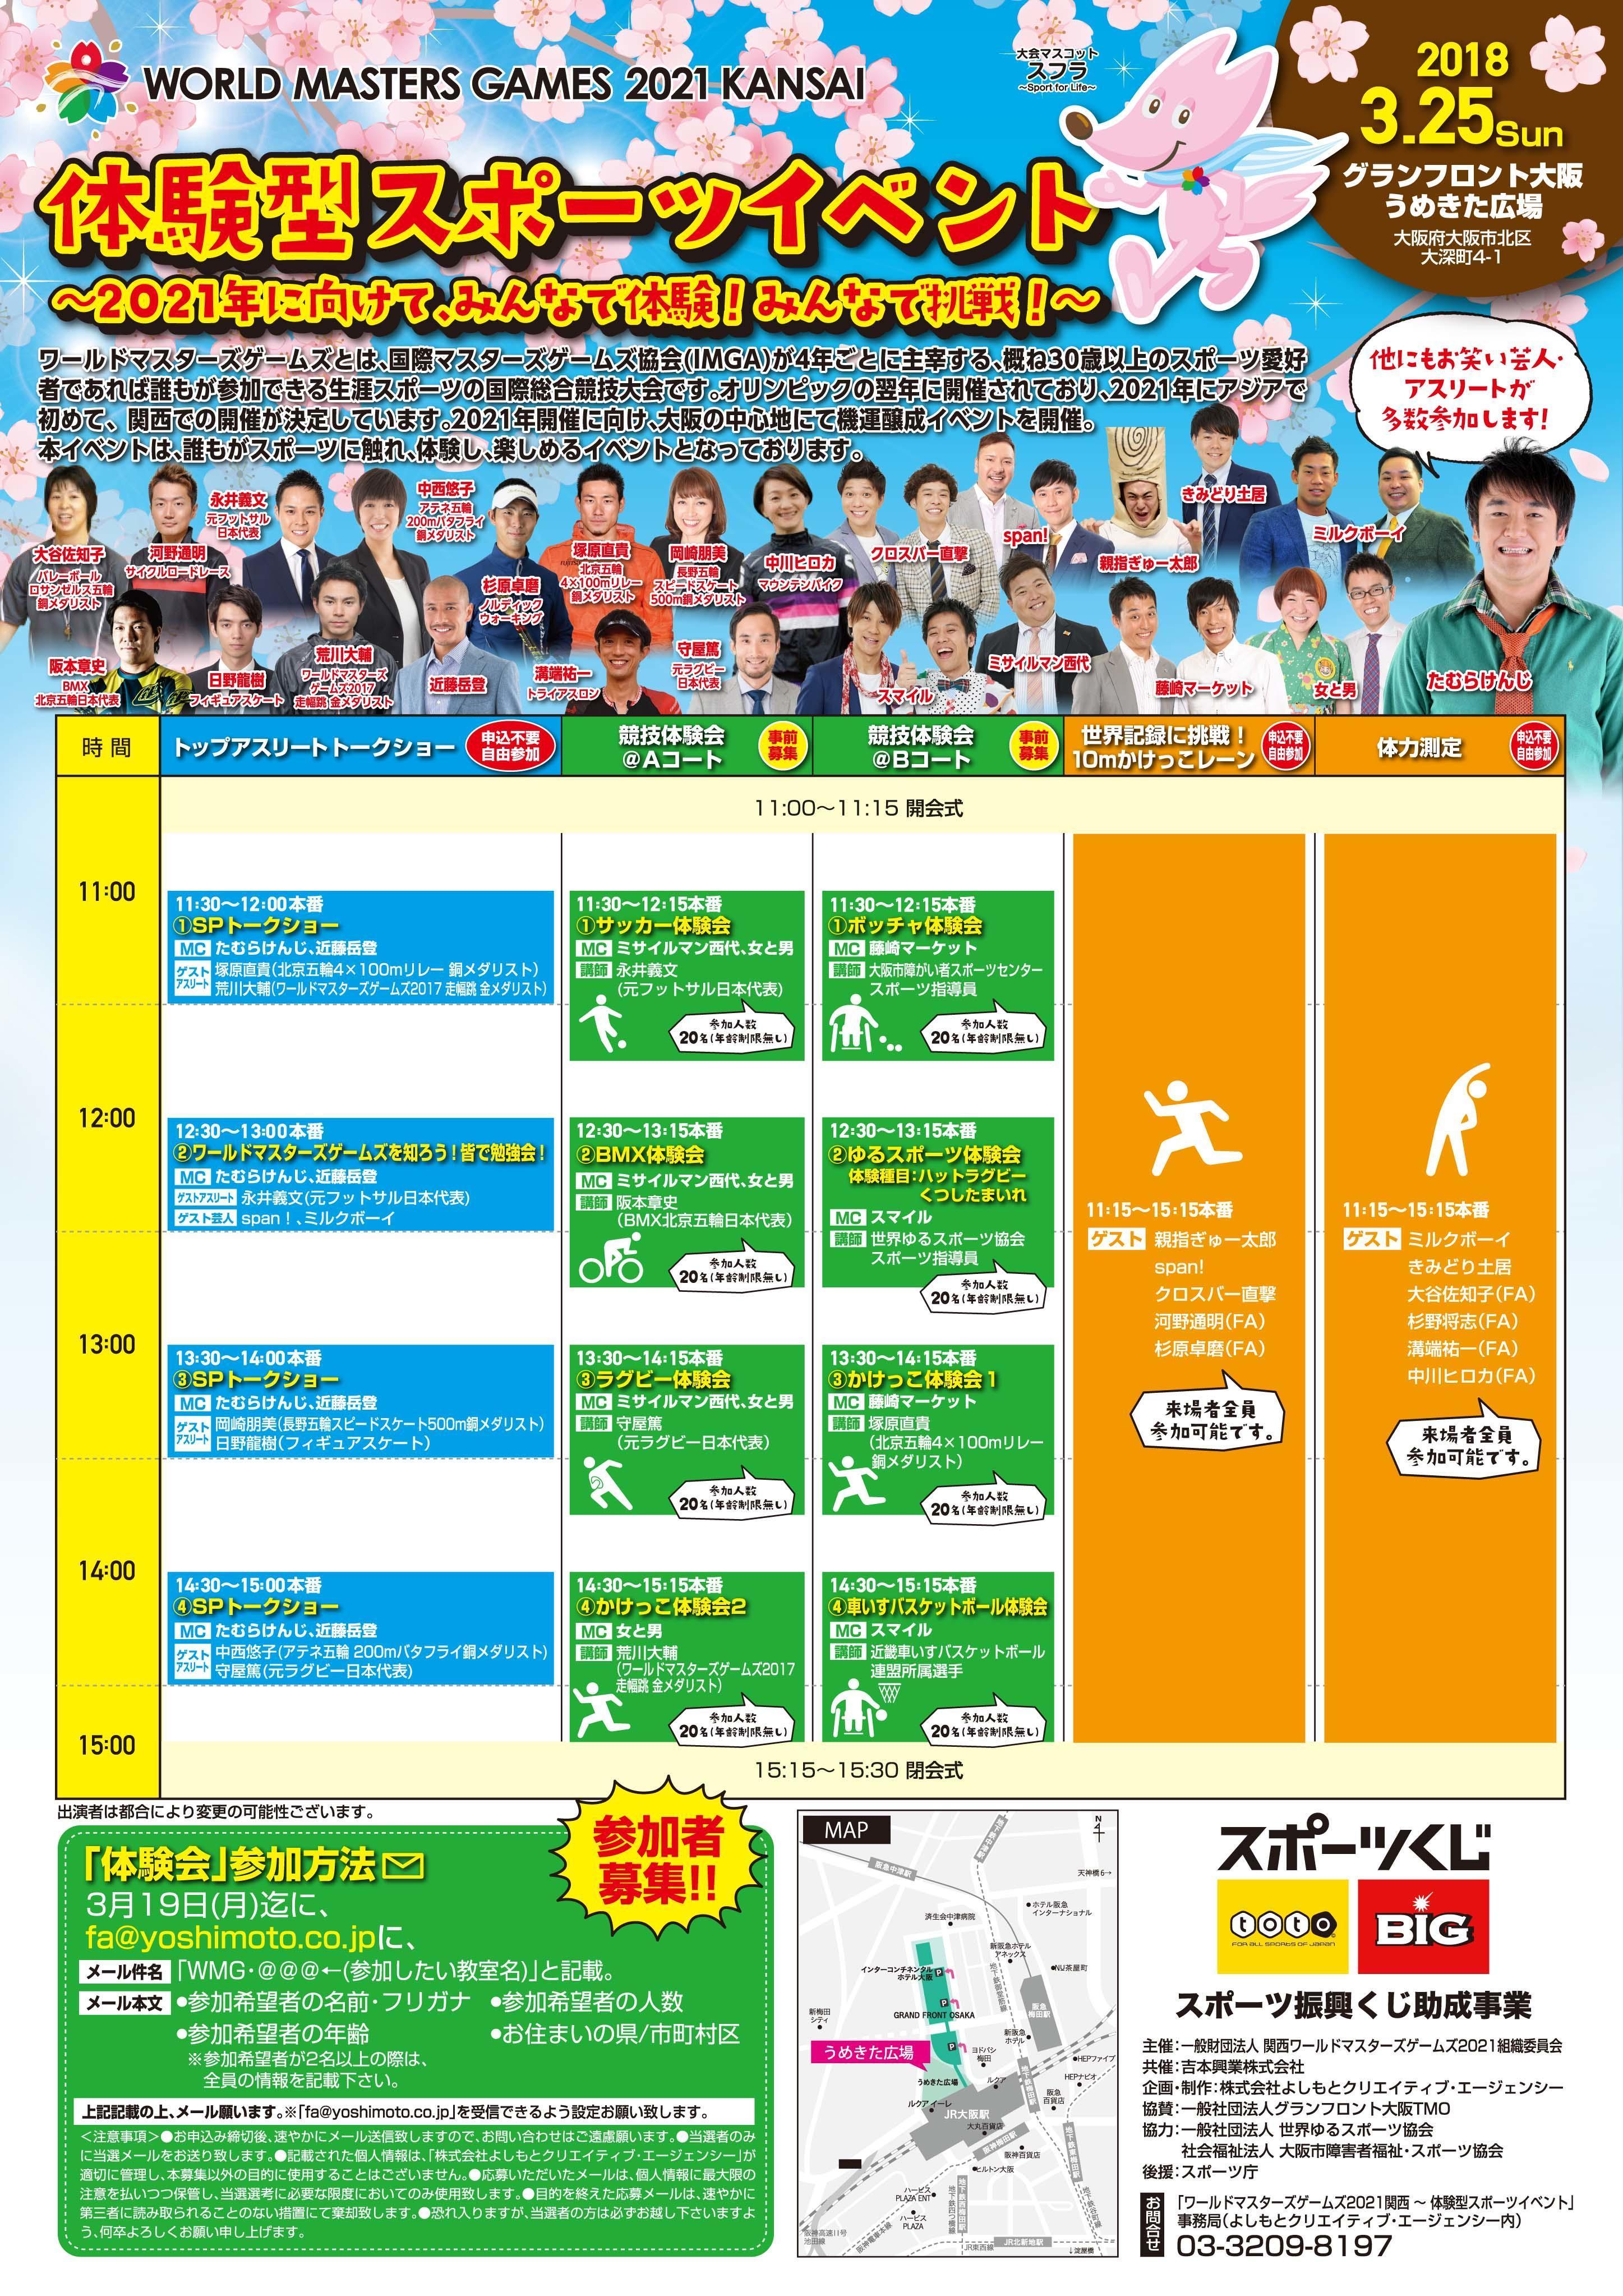 http://news.yoshimoto.co.jp/20180205212522-932be03c2e24fe9dc59854501aeebe5a9eccc719.jpg